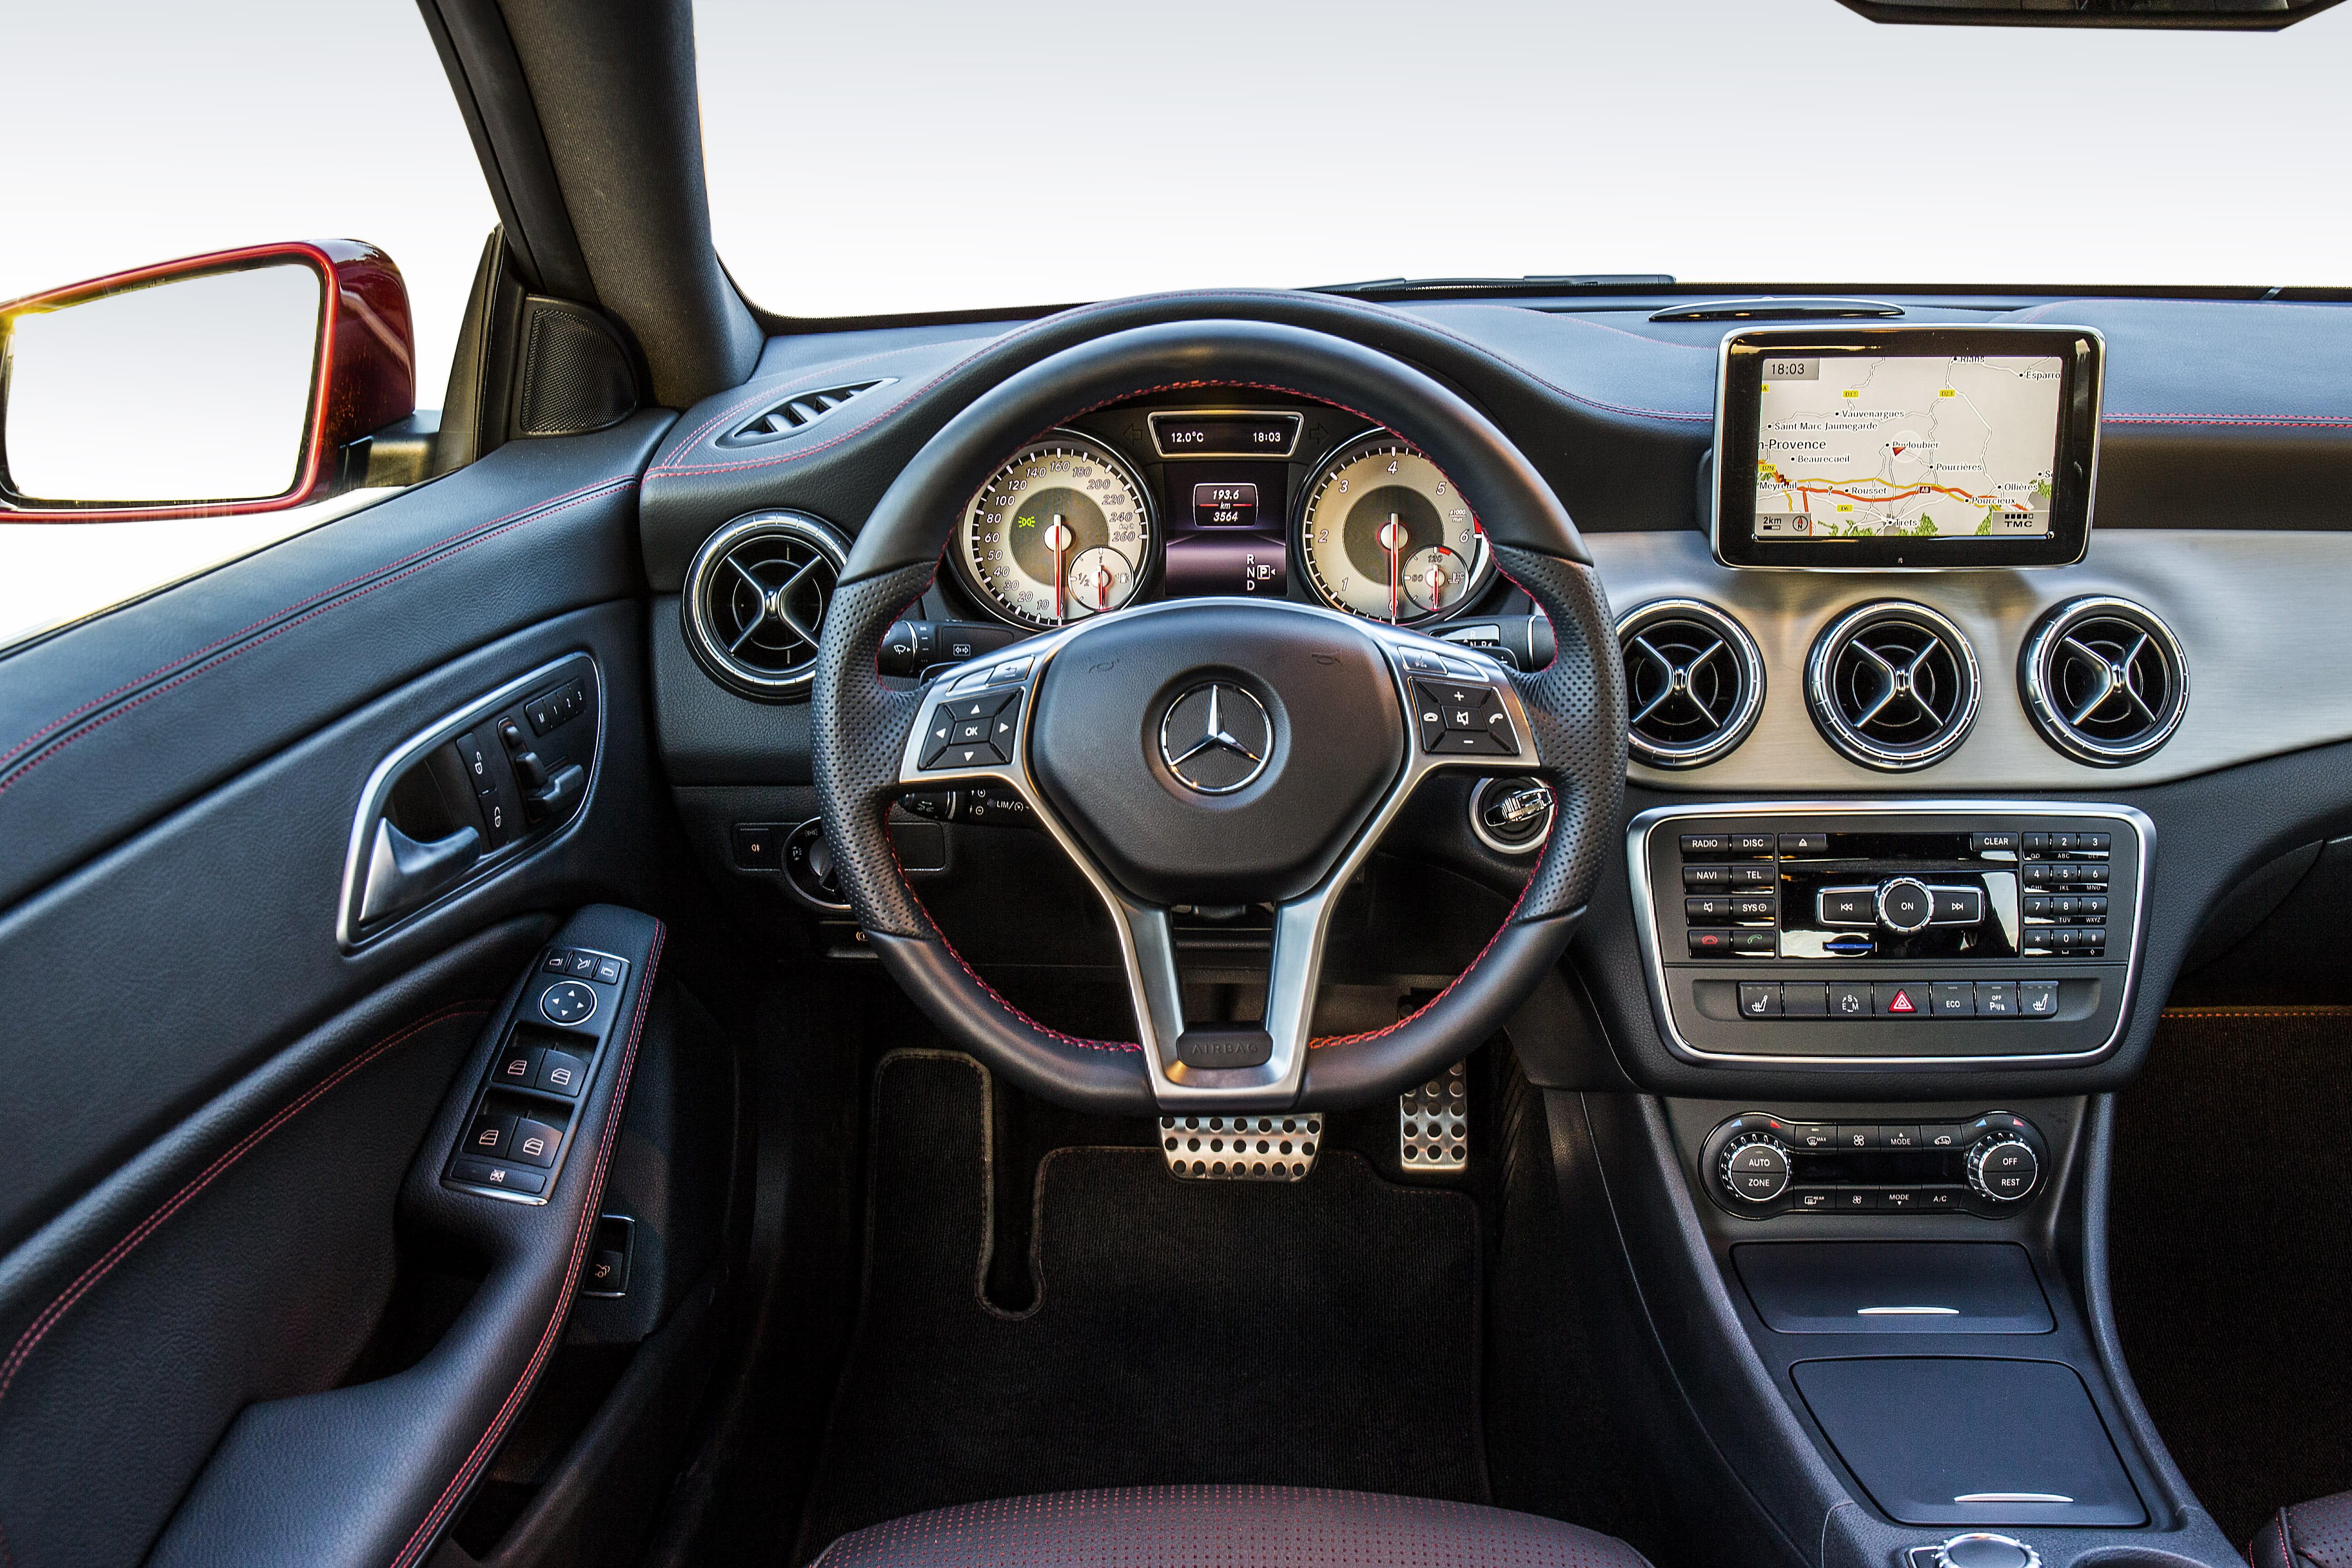 Mercedes benz cla 220 cdi sport patagonienrot for Cdi interior design